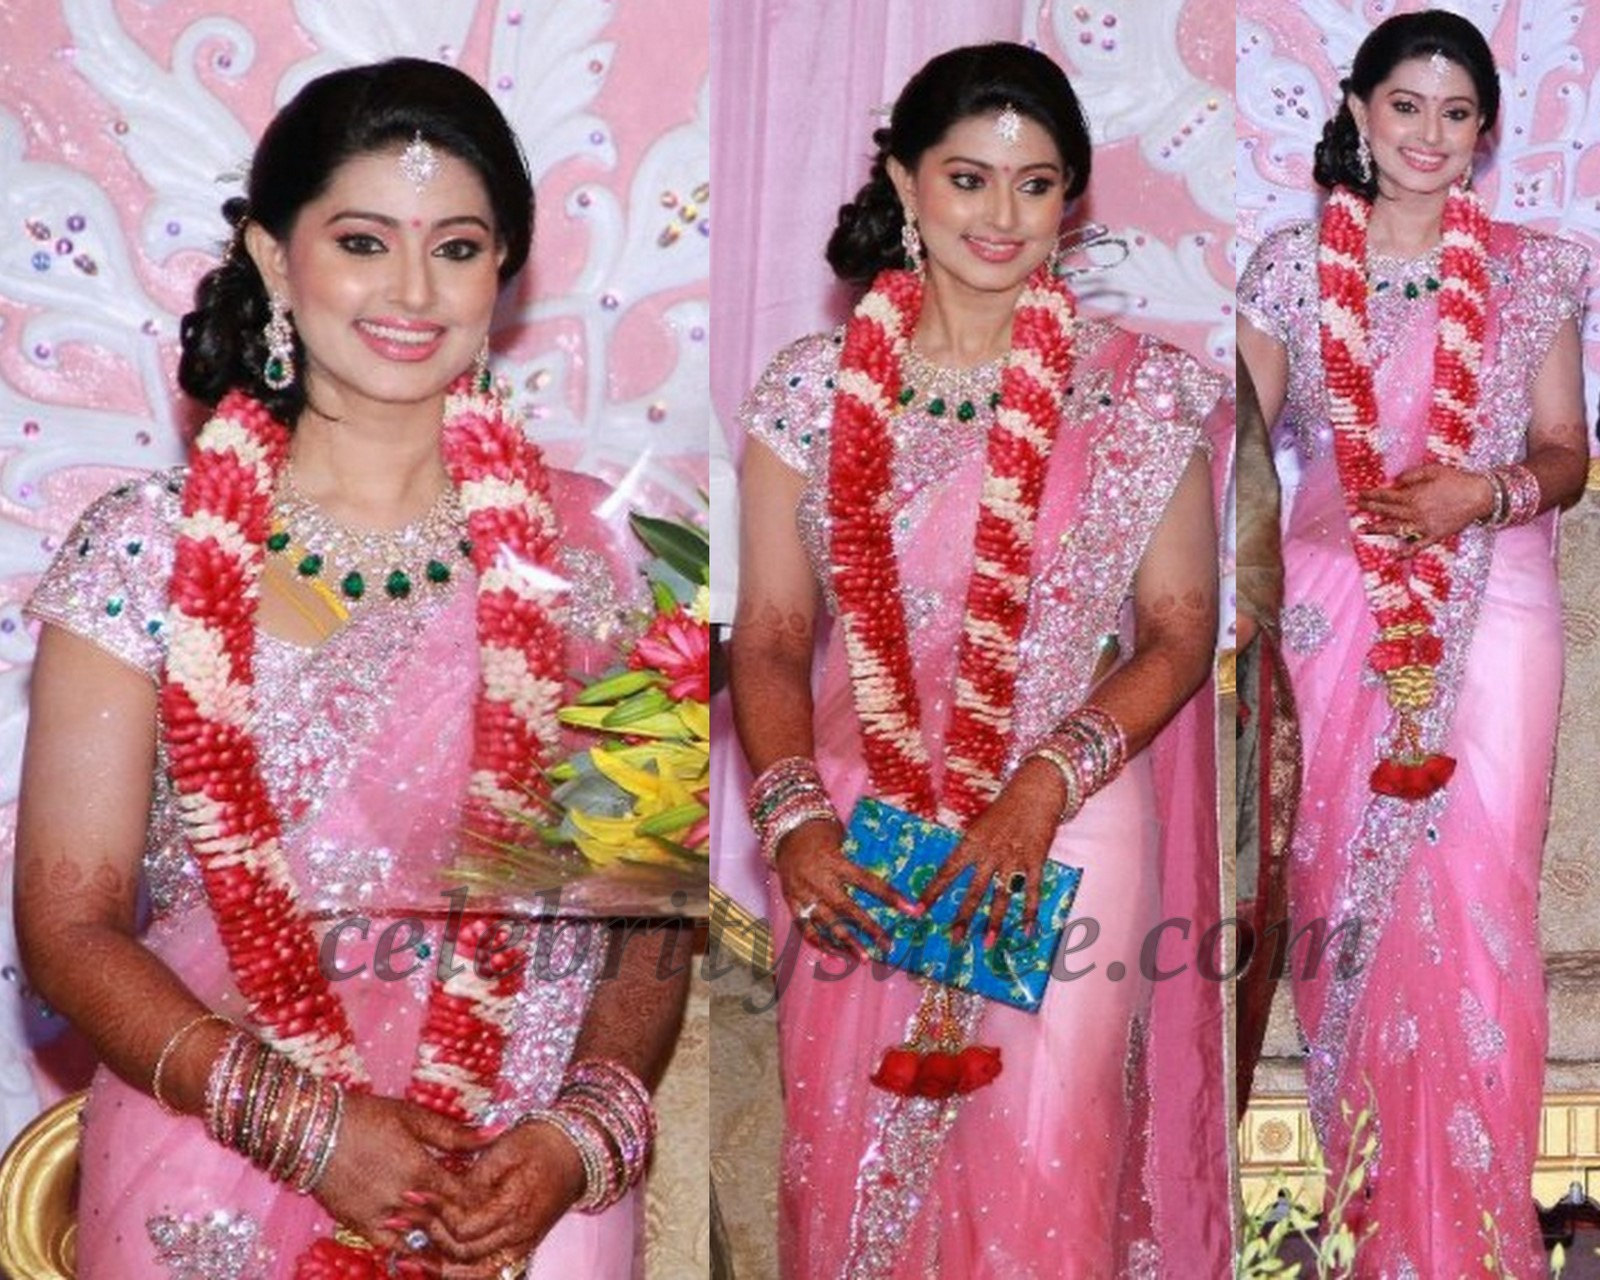 Sneha In Pink Designer Sari At Her Wedding Reception